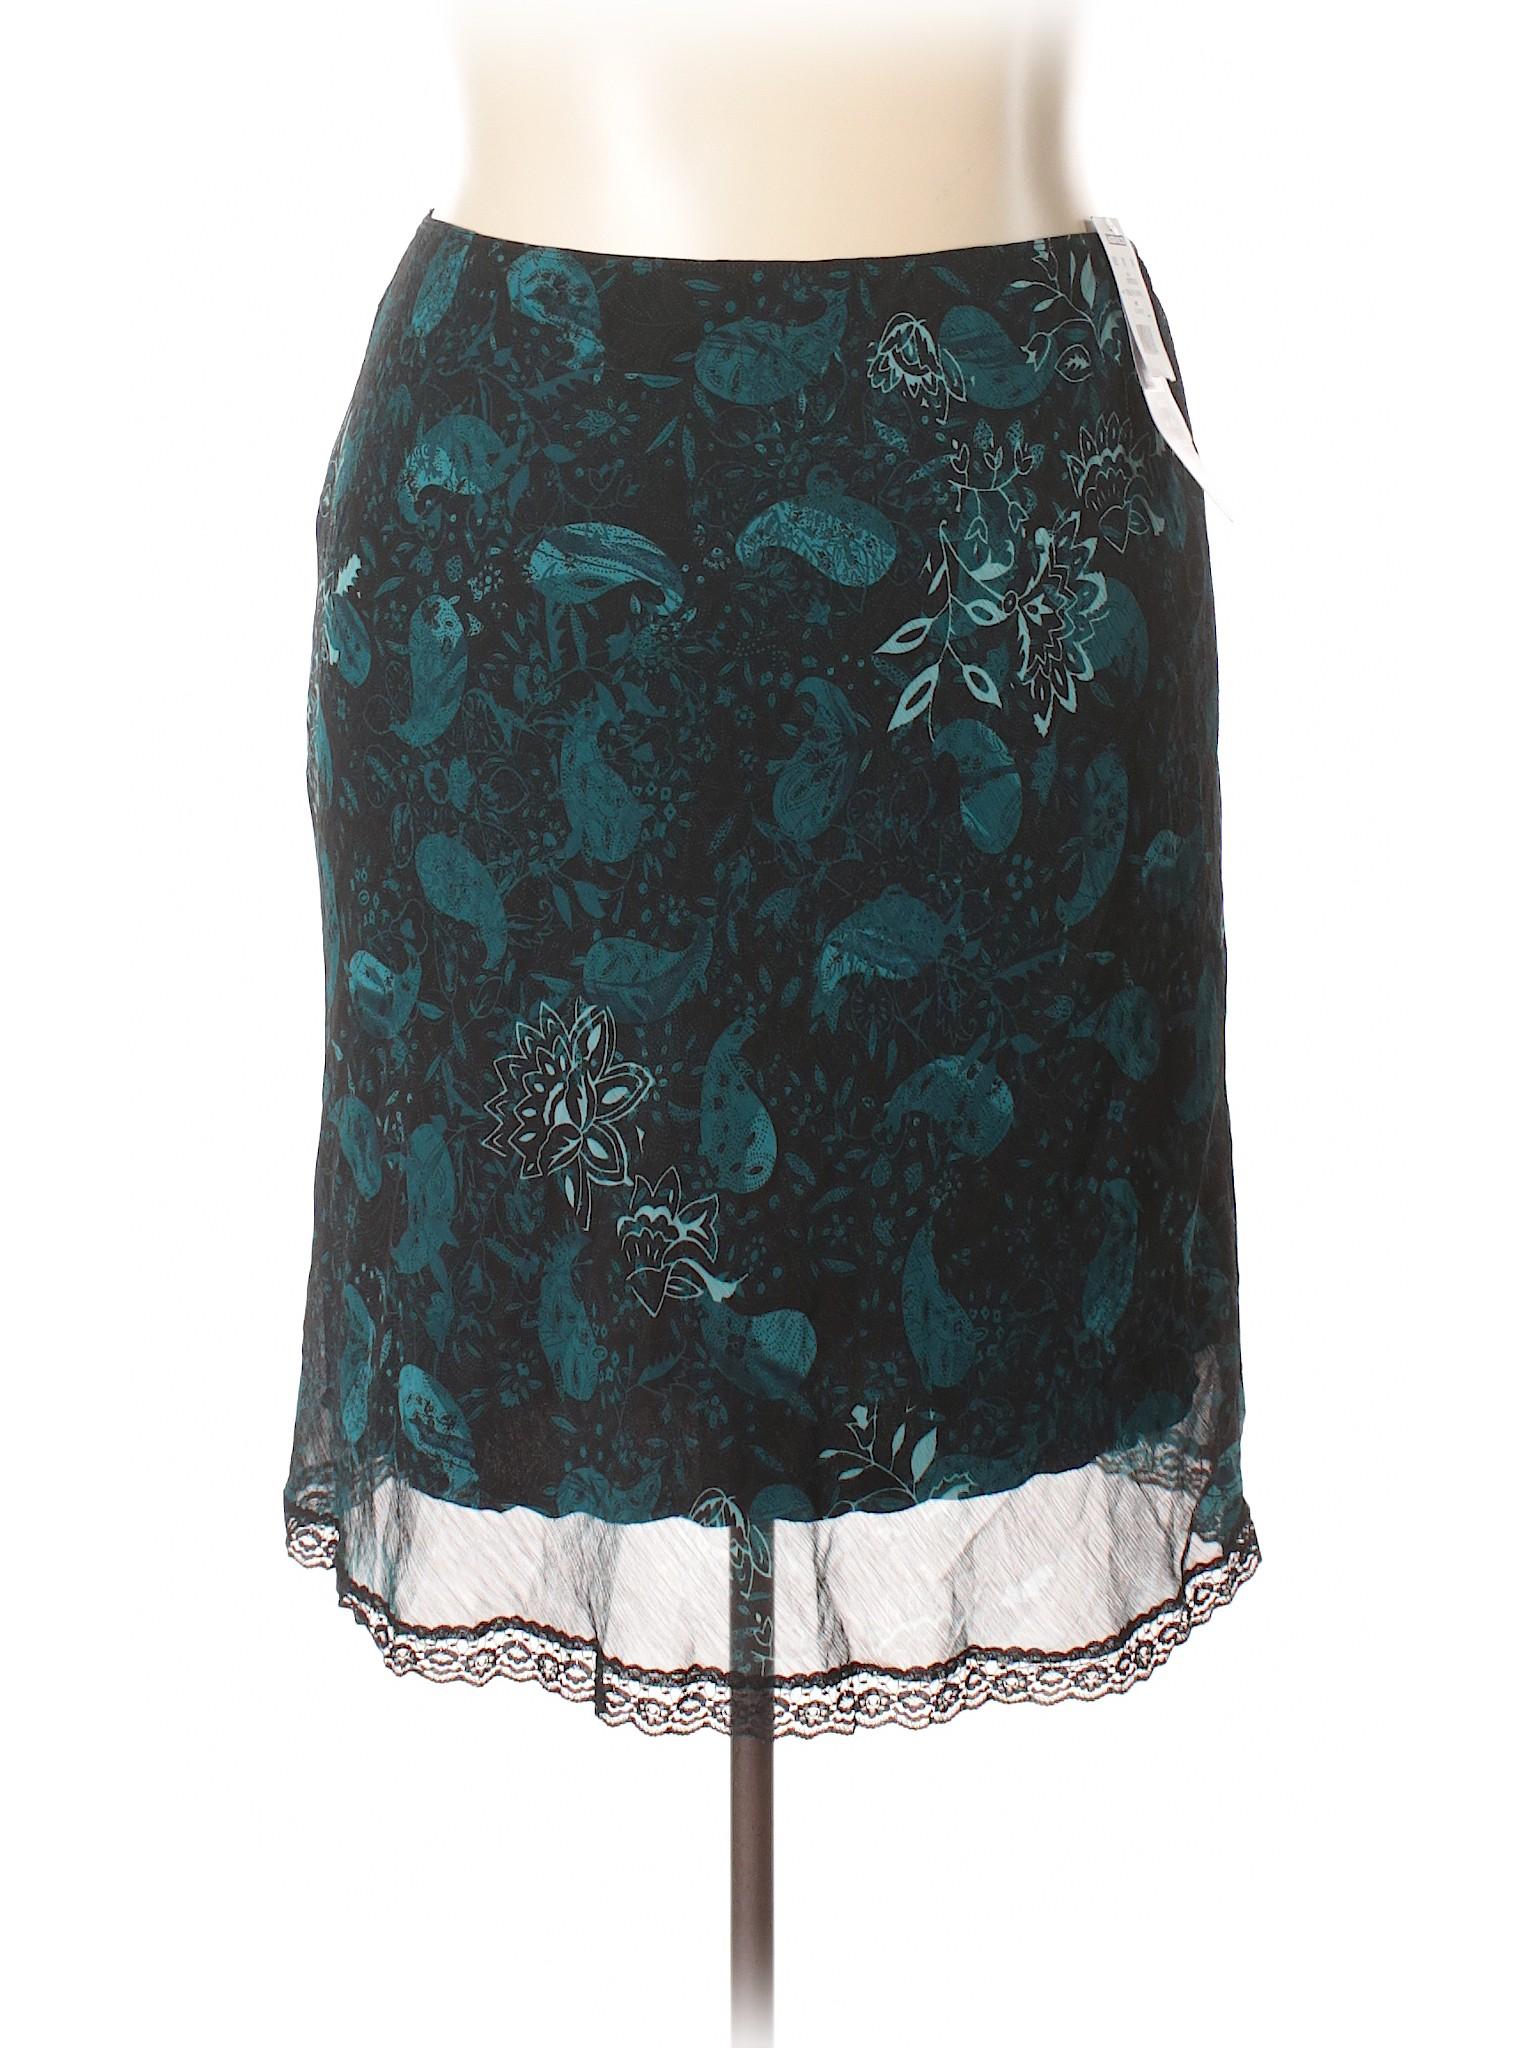 Skirt Boutique Casual Casual Casual Skirt Boutique Skirt Boutique Skirt Boutique Casual dq00pwFH